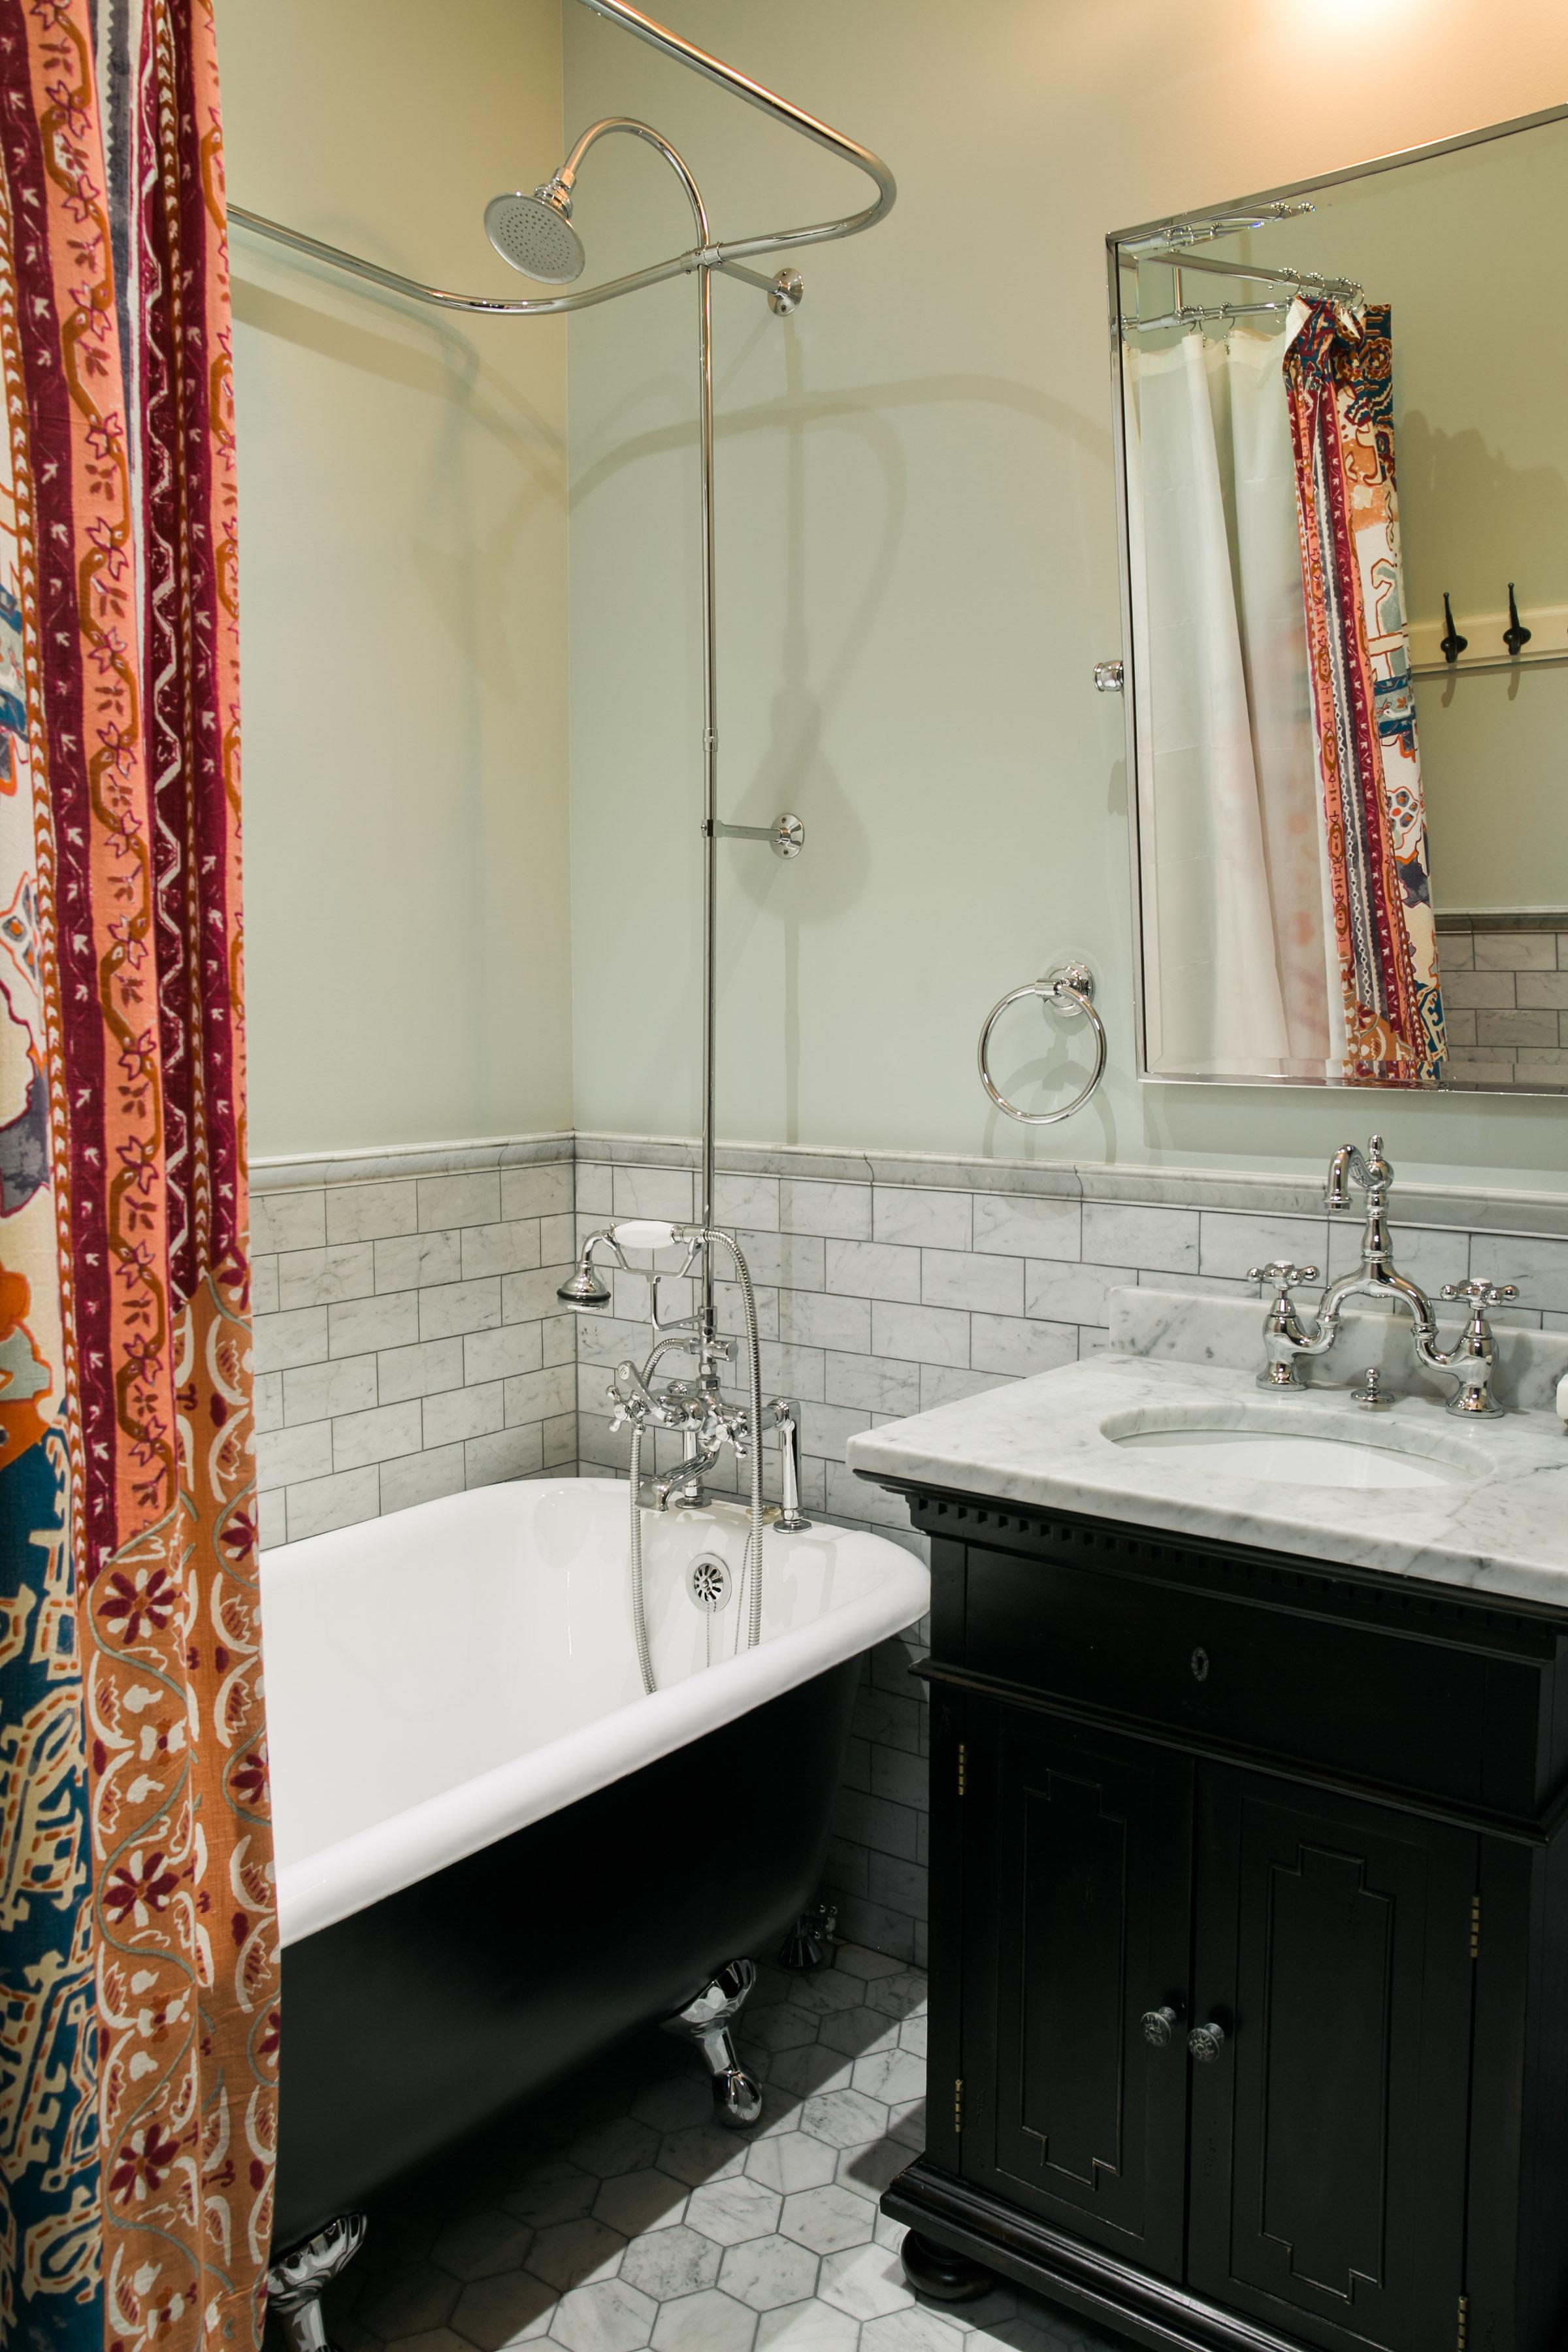 Bathroom_2_002.jpg